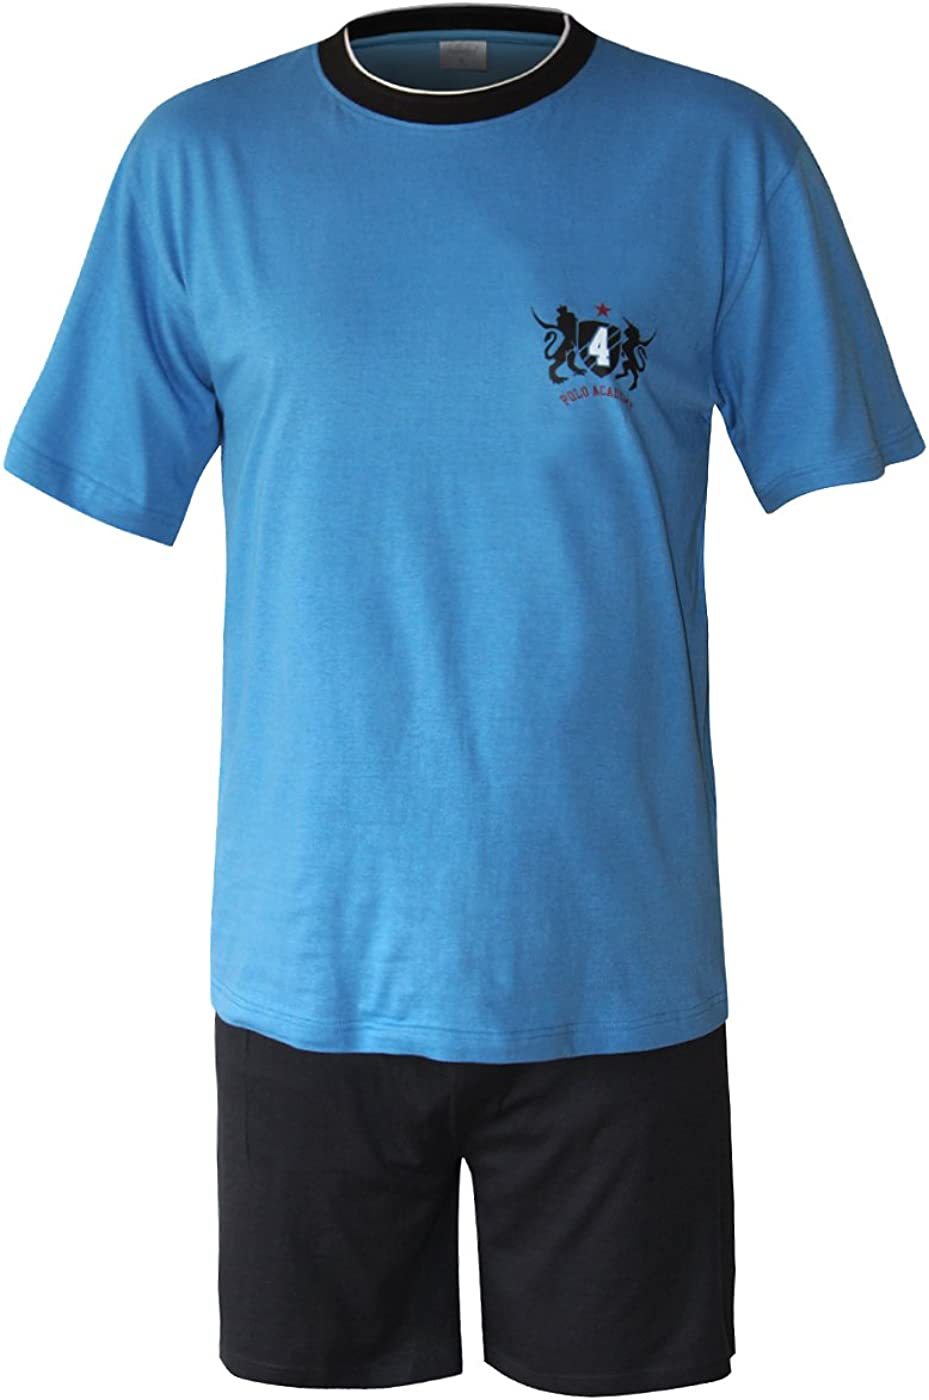 Moonline nightwear Herren Schlafanzug kurz in verschiedenen Ausf/ührungen Herren Pyjama kurz Herren Shorty Schlafanzug aus 100/% Baumwolle